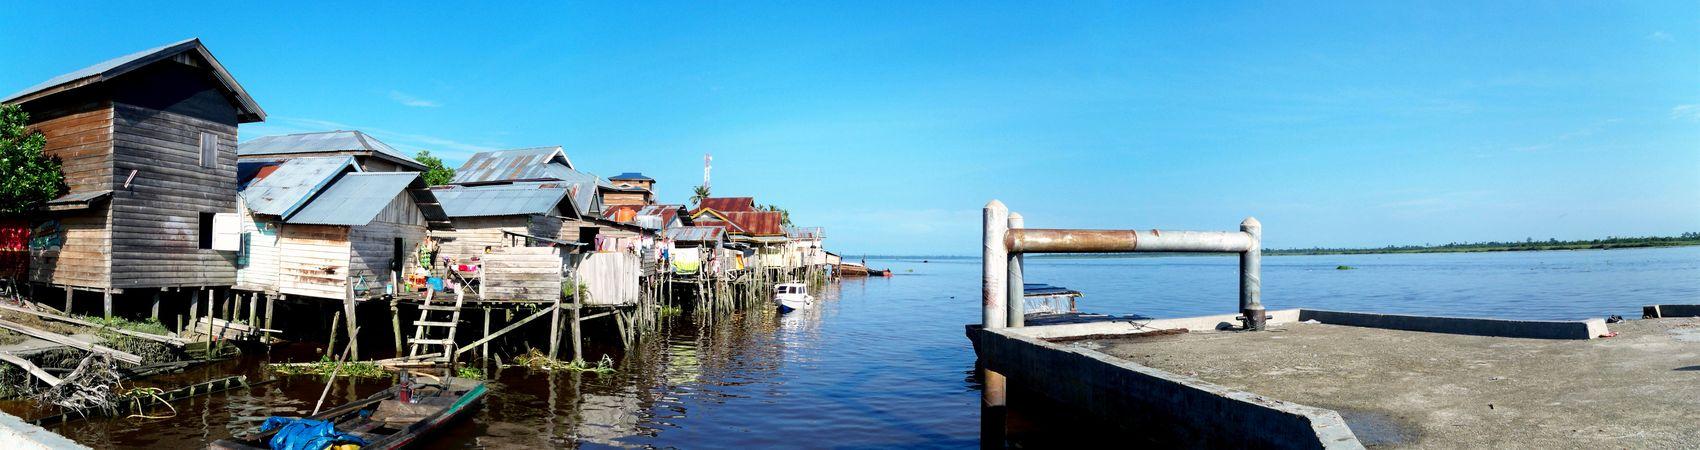 Bay Meranti Location BONO Waves Pekanbaru Riau Indonesia Malephotographerofthemonth Surf Life EyeEm Best Shots